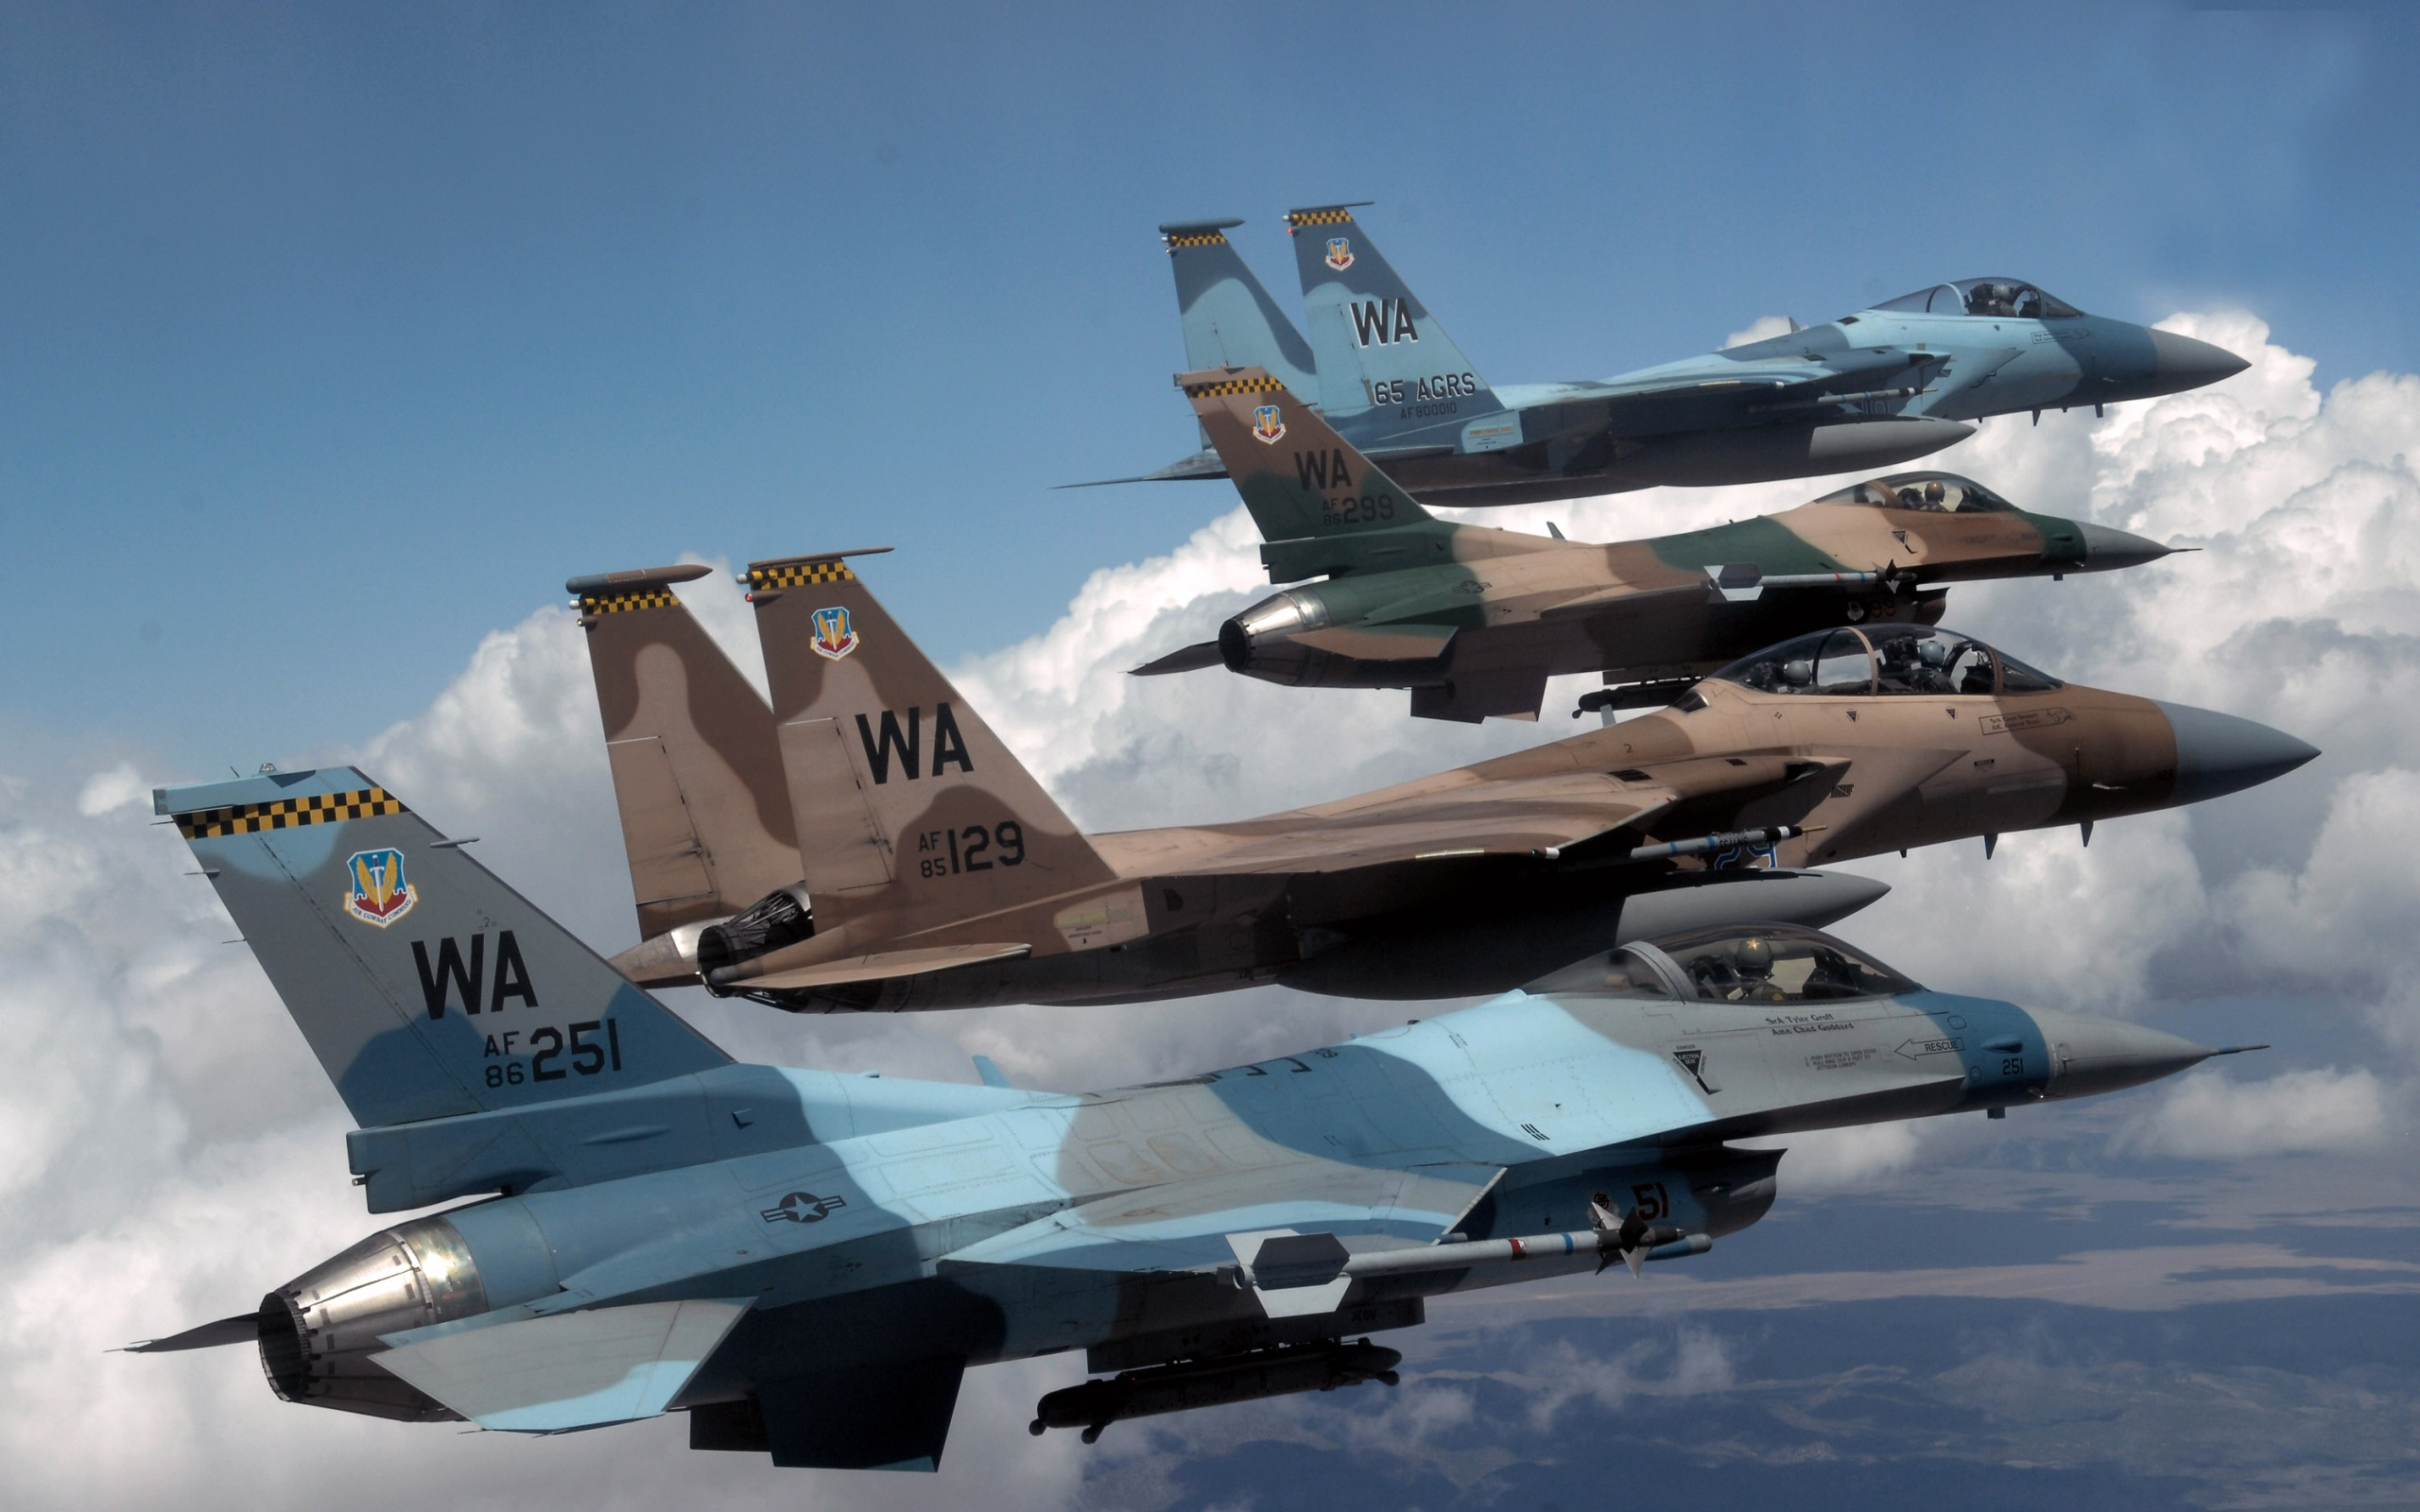 Aircraft Wallpapers 4 u F 16 Aircraft Wallpapers 2560x1600